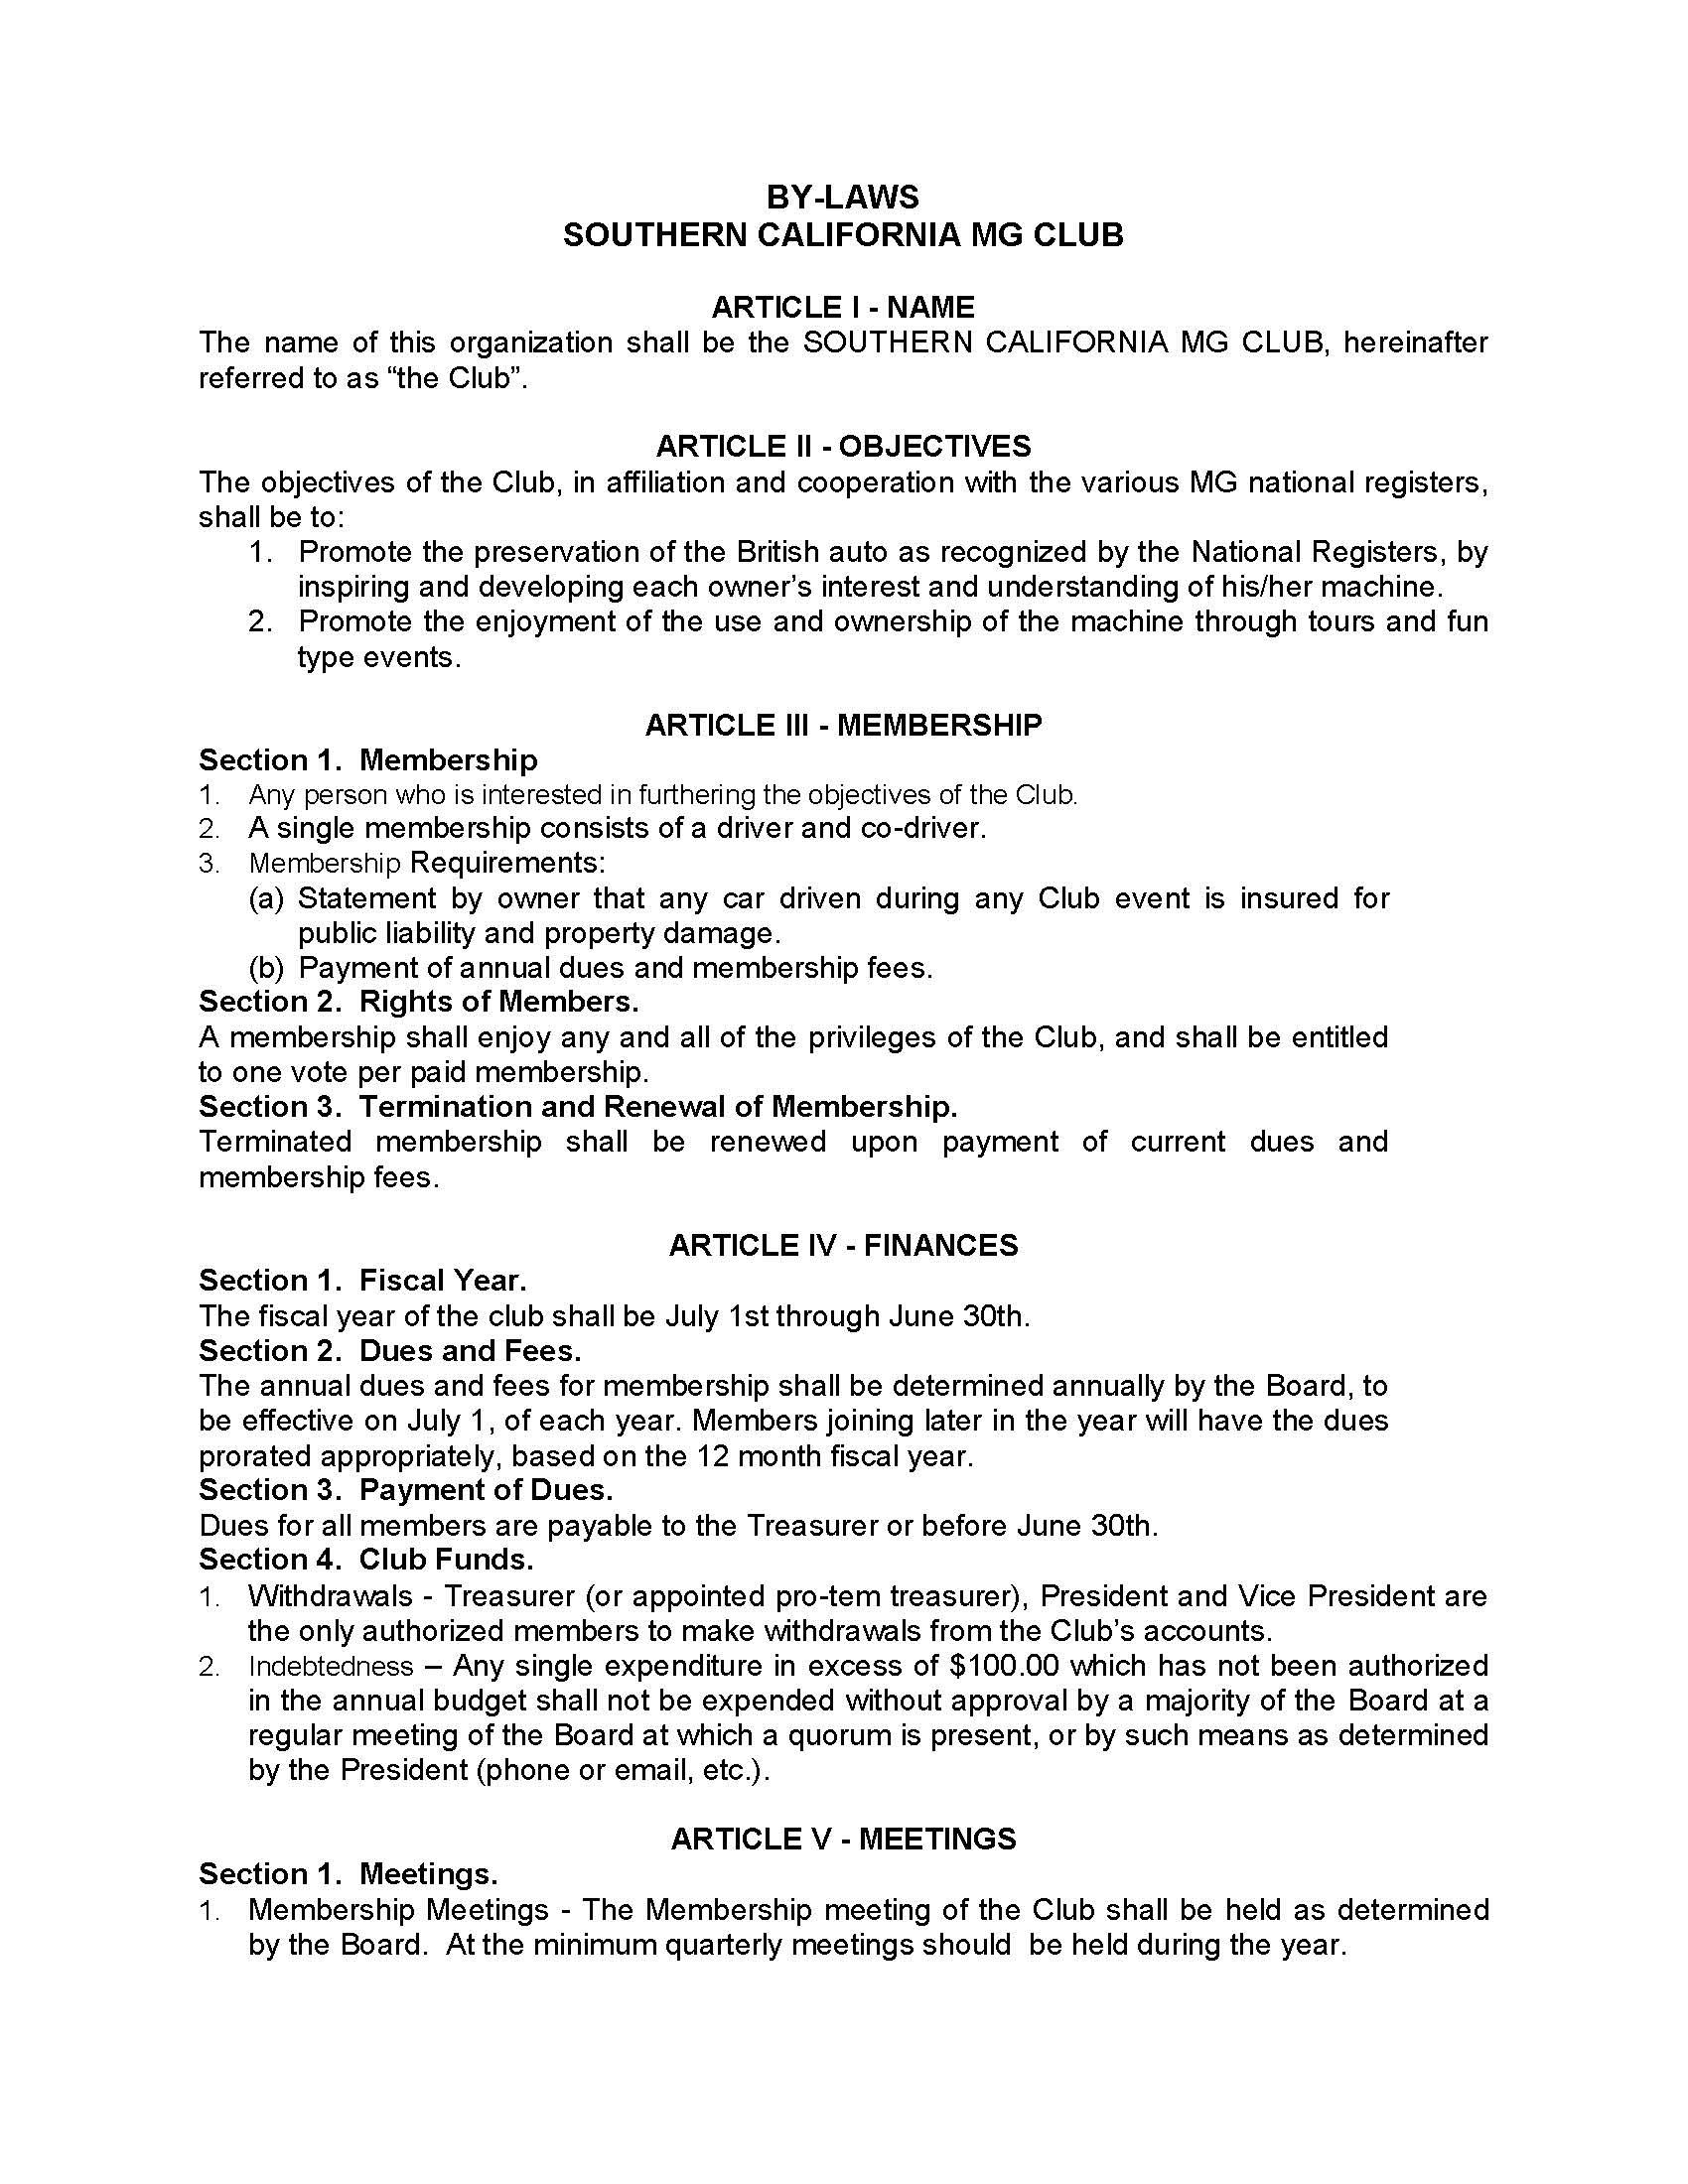 bylaws socal mg club